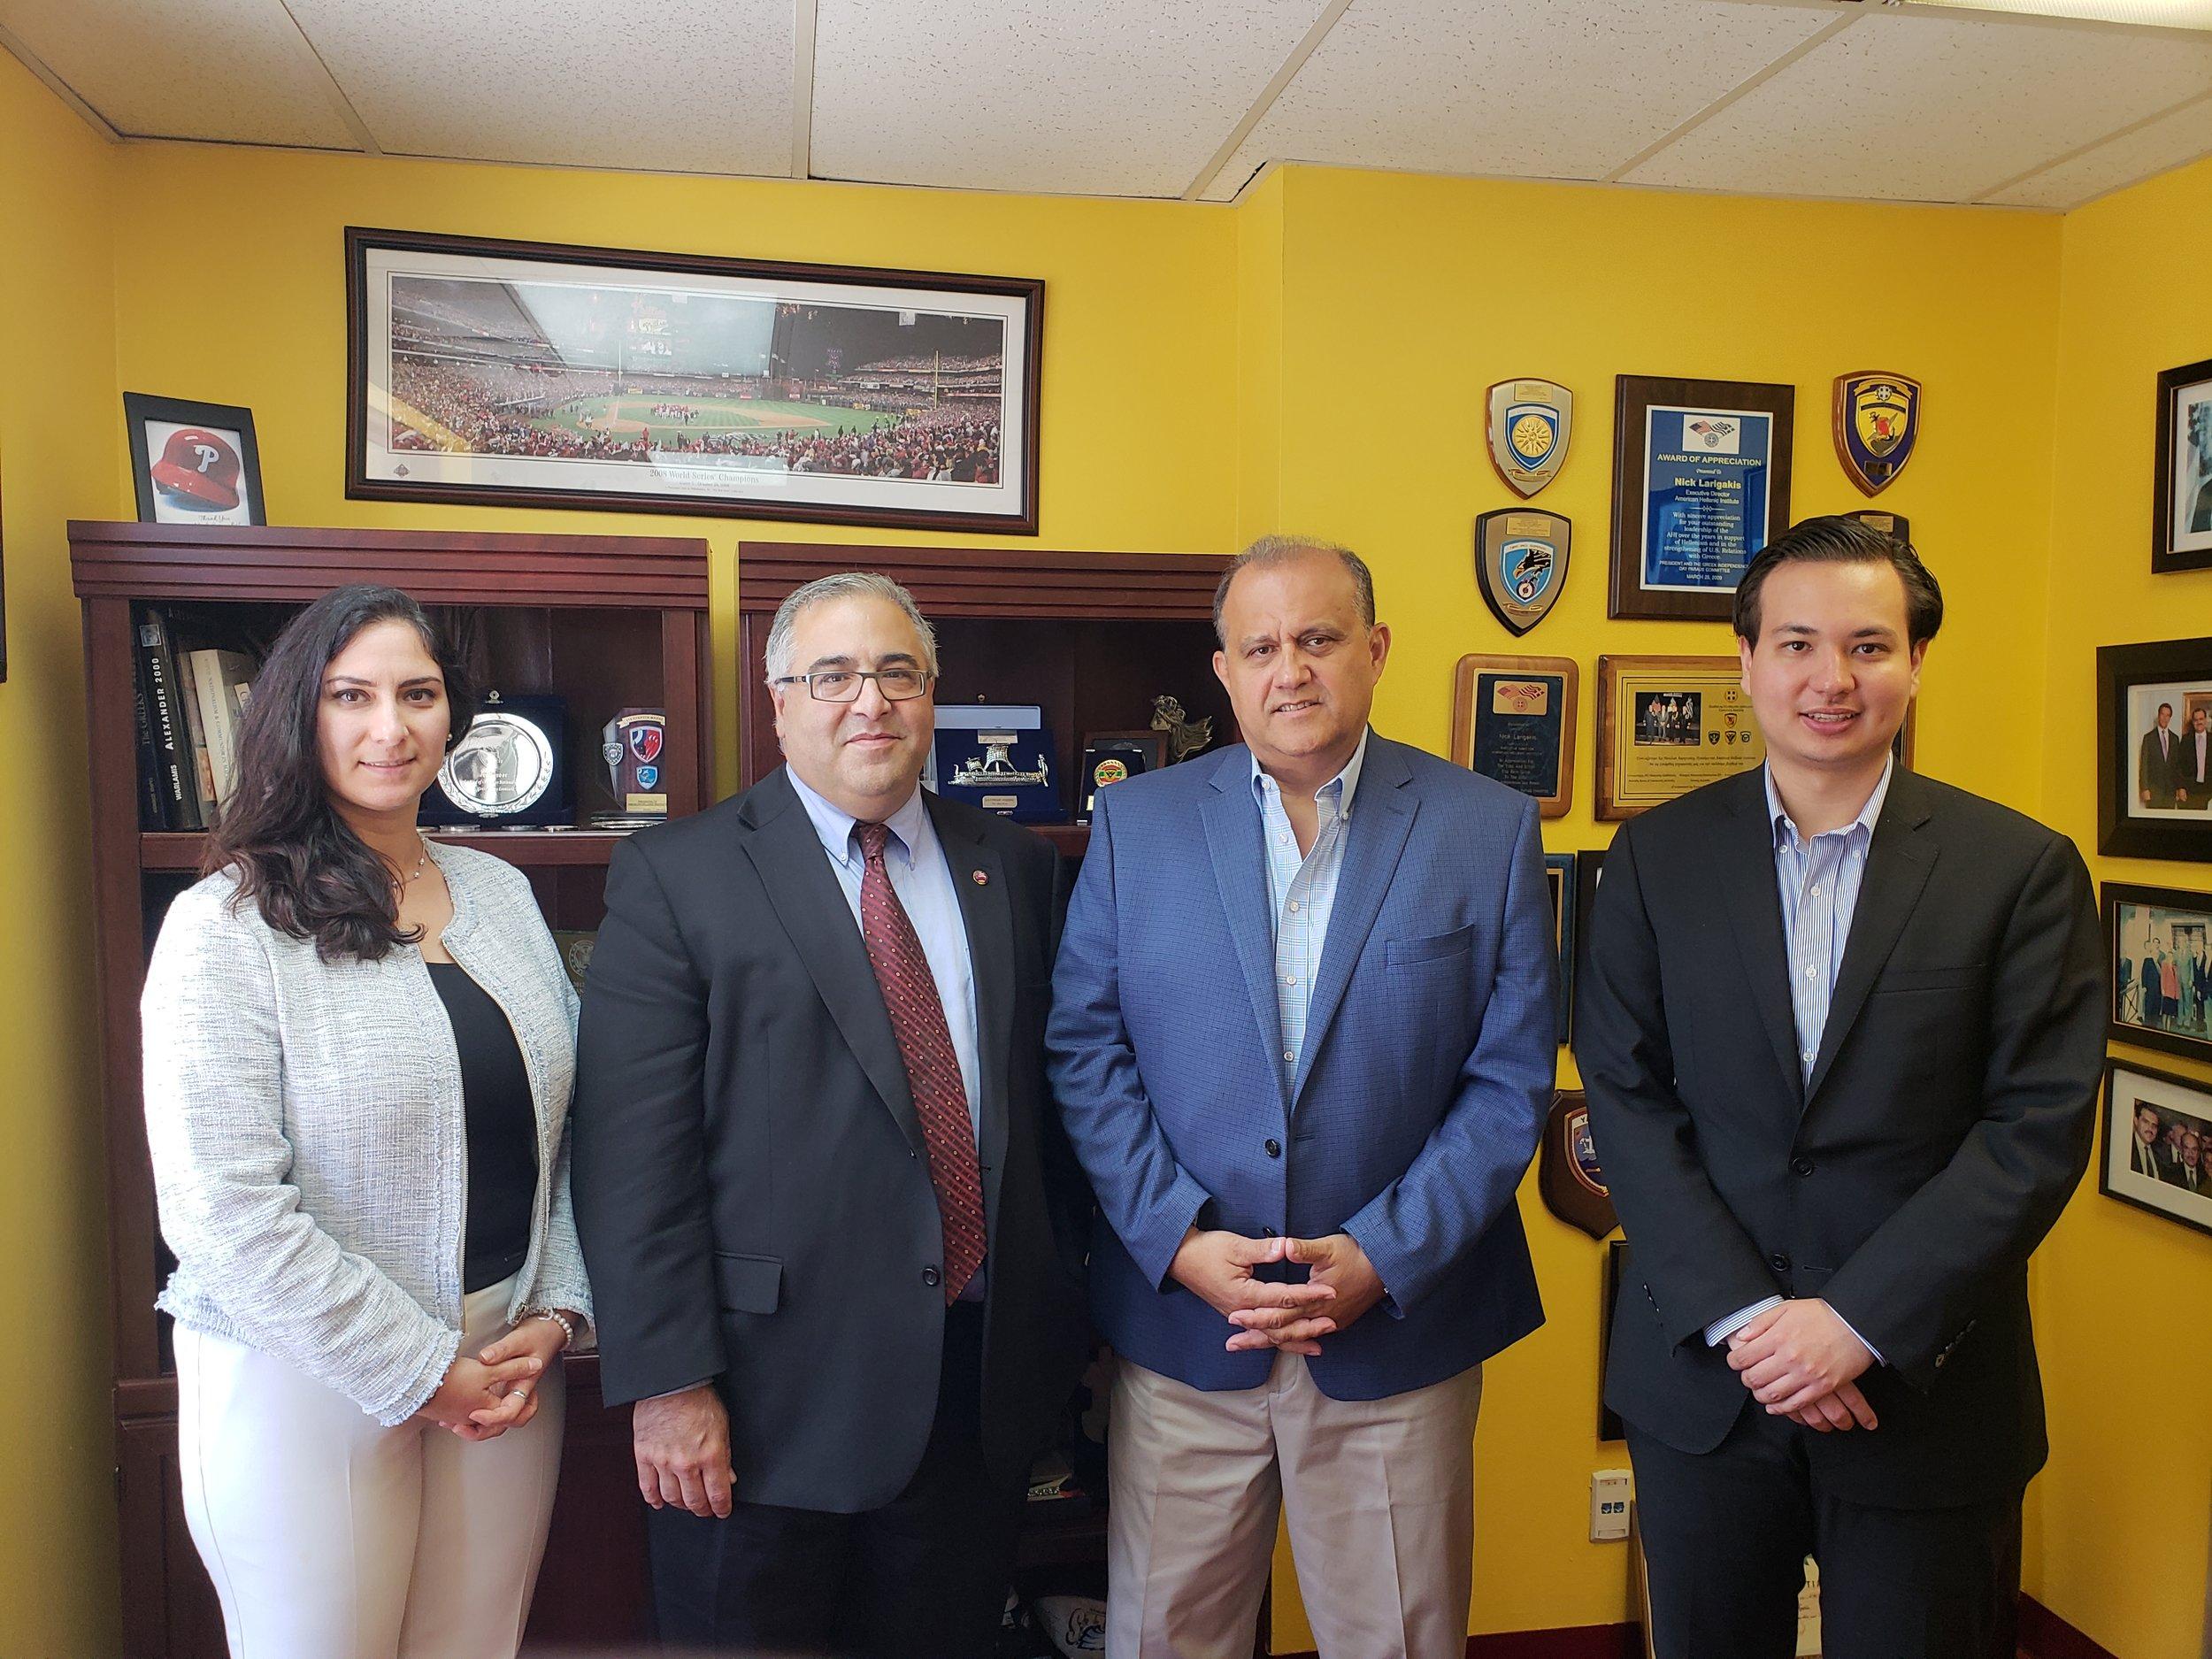 (L-R) Tereza Yeriman, ANCA Government Affairs Director, ANCA Executive Director Aram Hamparian, AHI President Larigakis, and Legislative Assistant Elias Gerasoulis